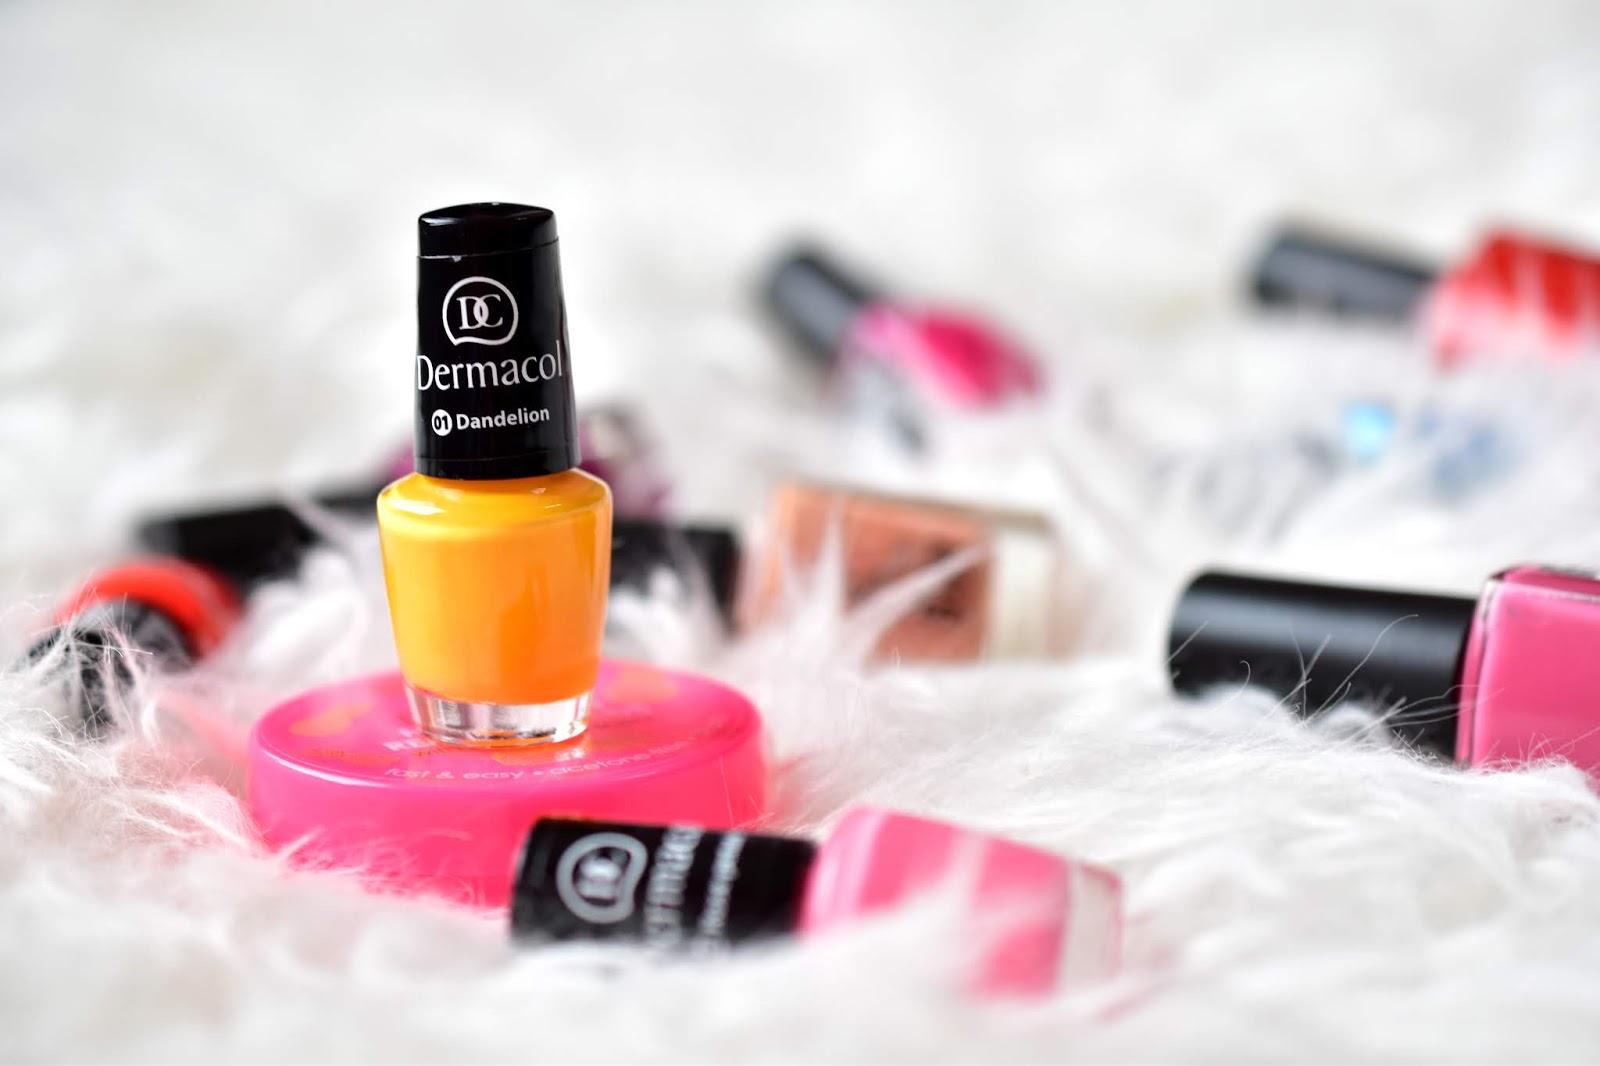 dermacol mini summer collection dandelion